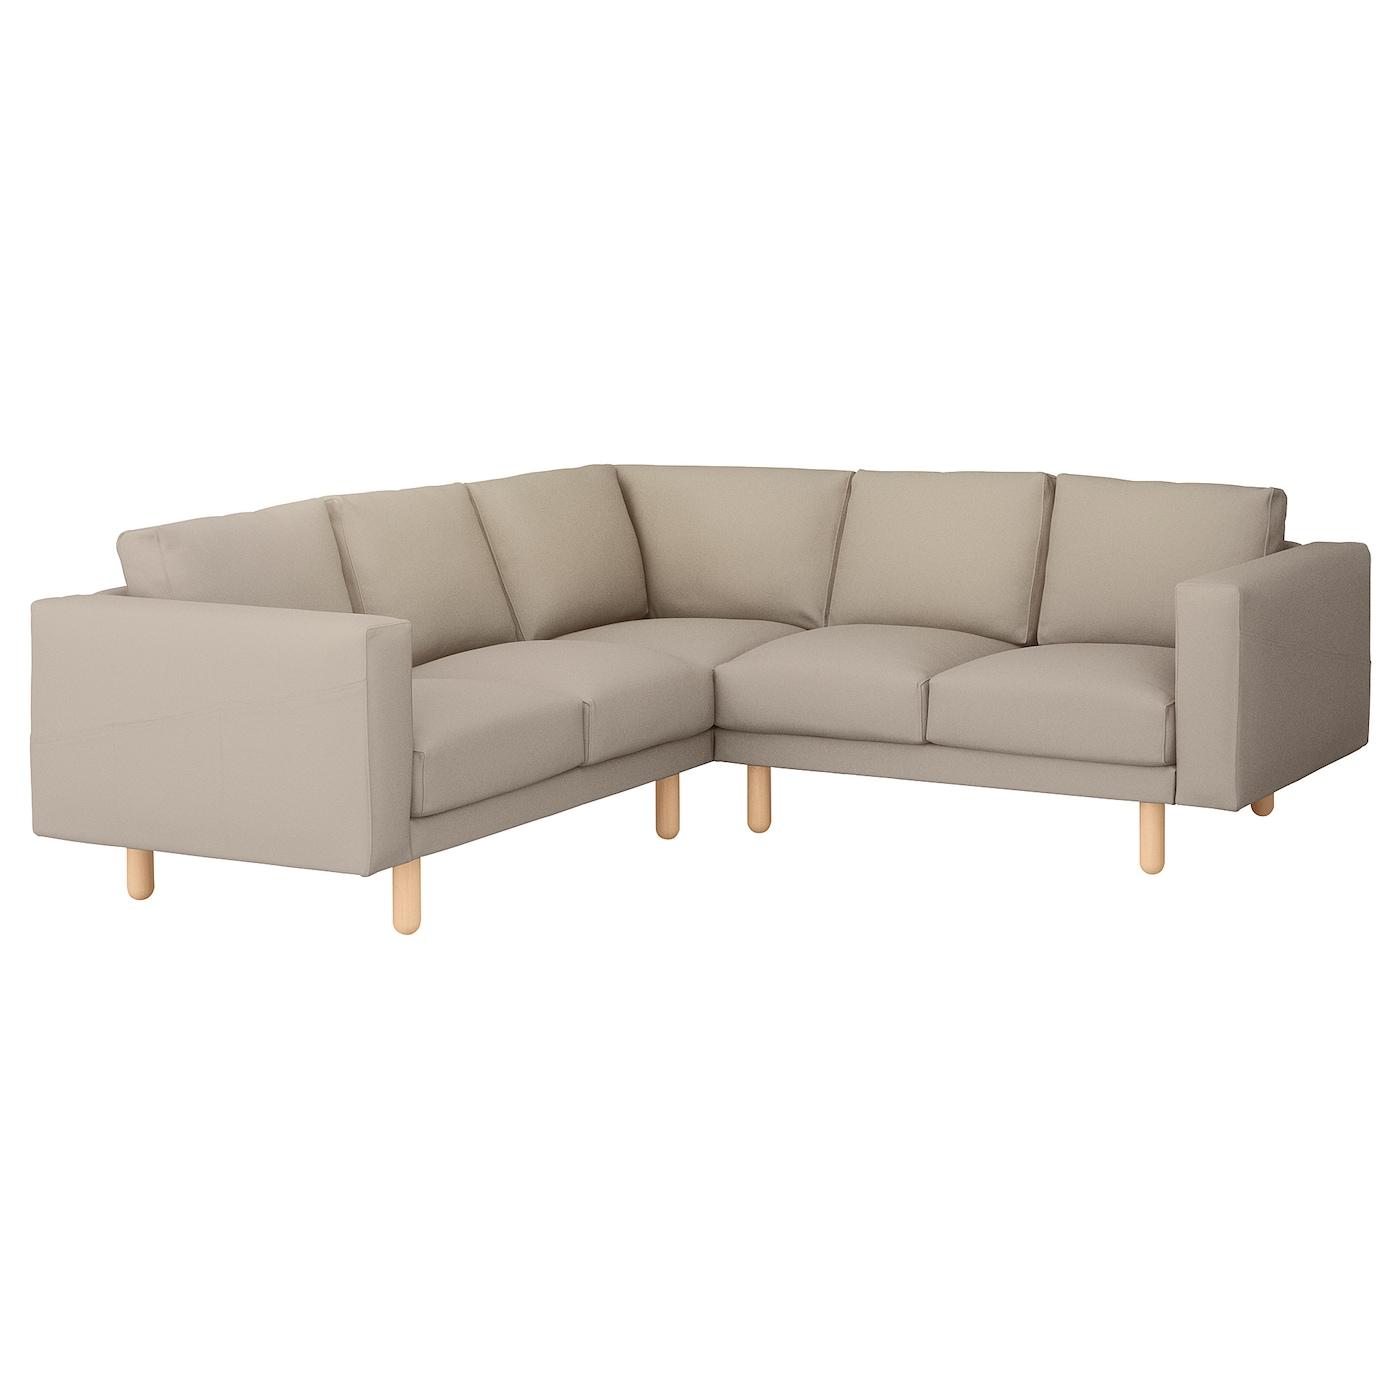 NORSBORG Corner sofa 2 2 cover Gräsbo beige IKEA